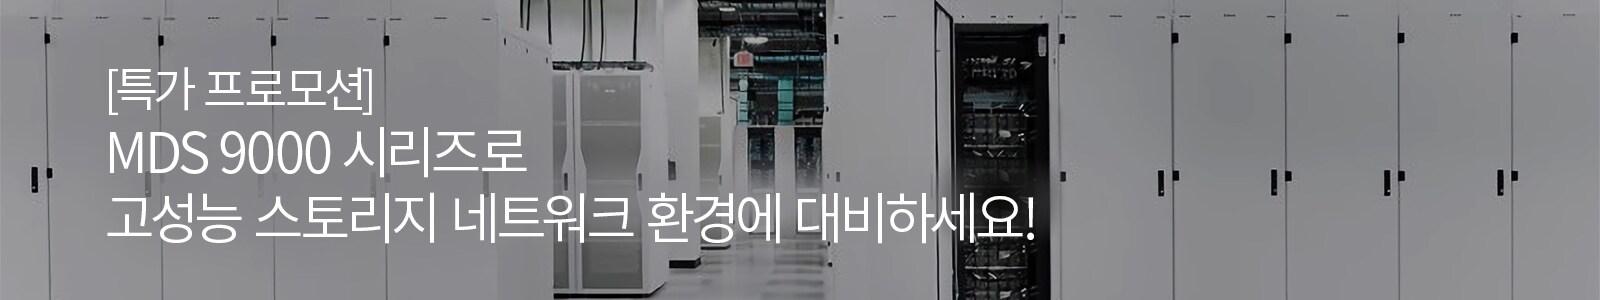 MDS 9000 소개